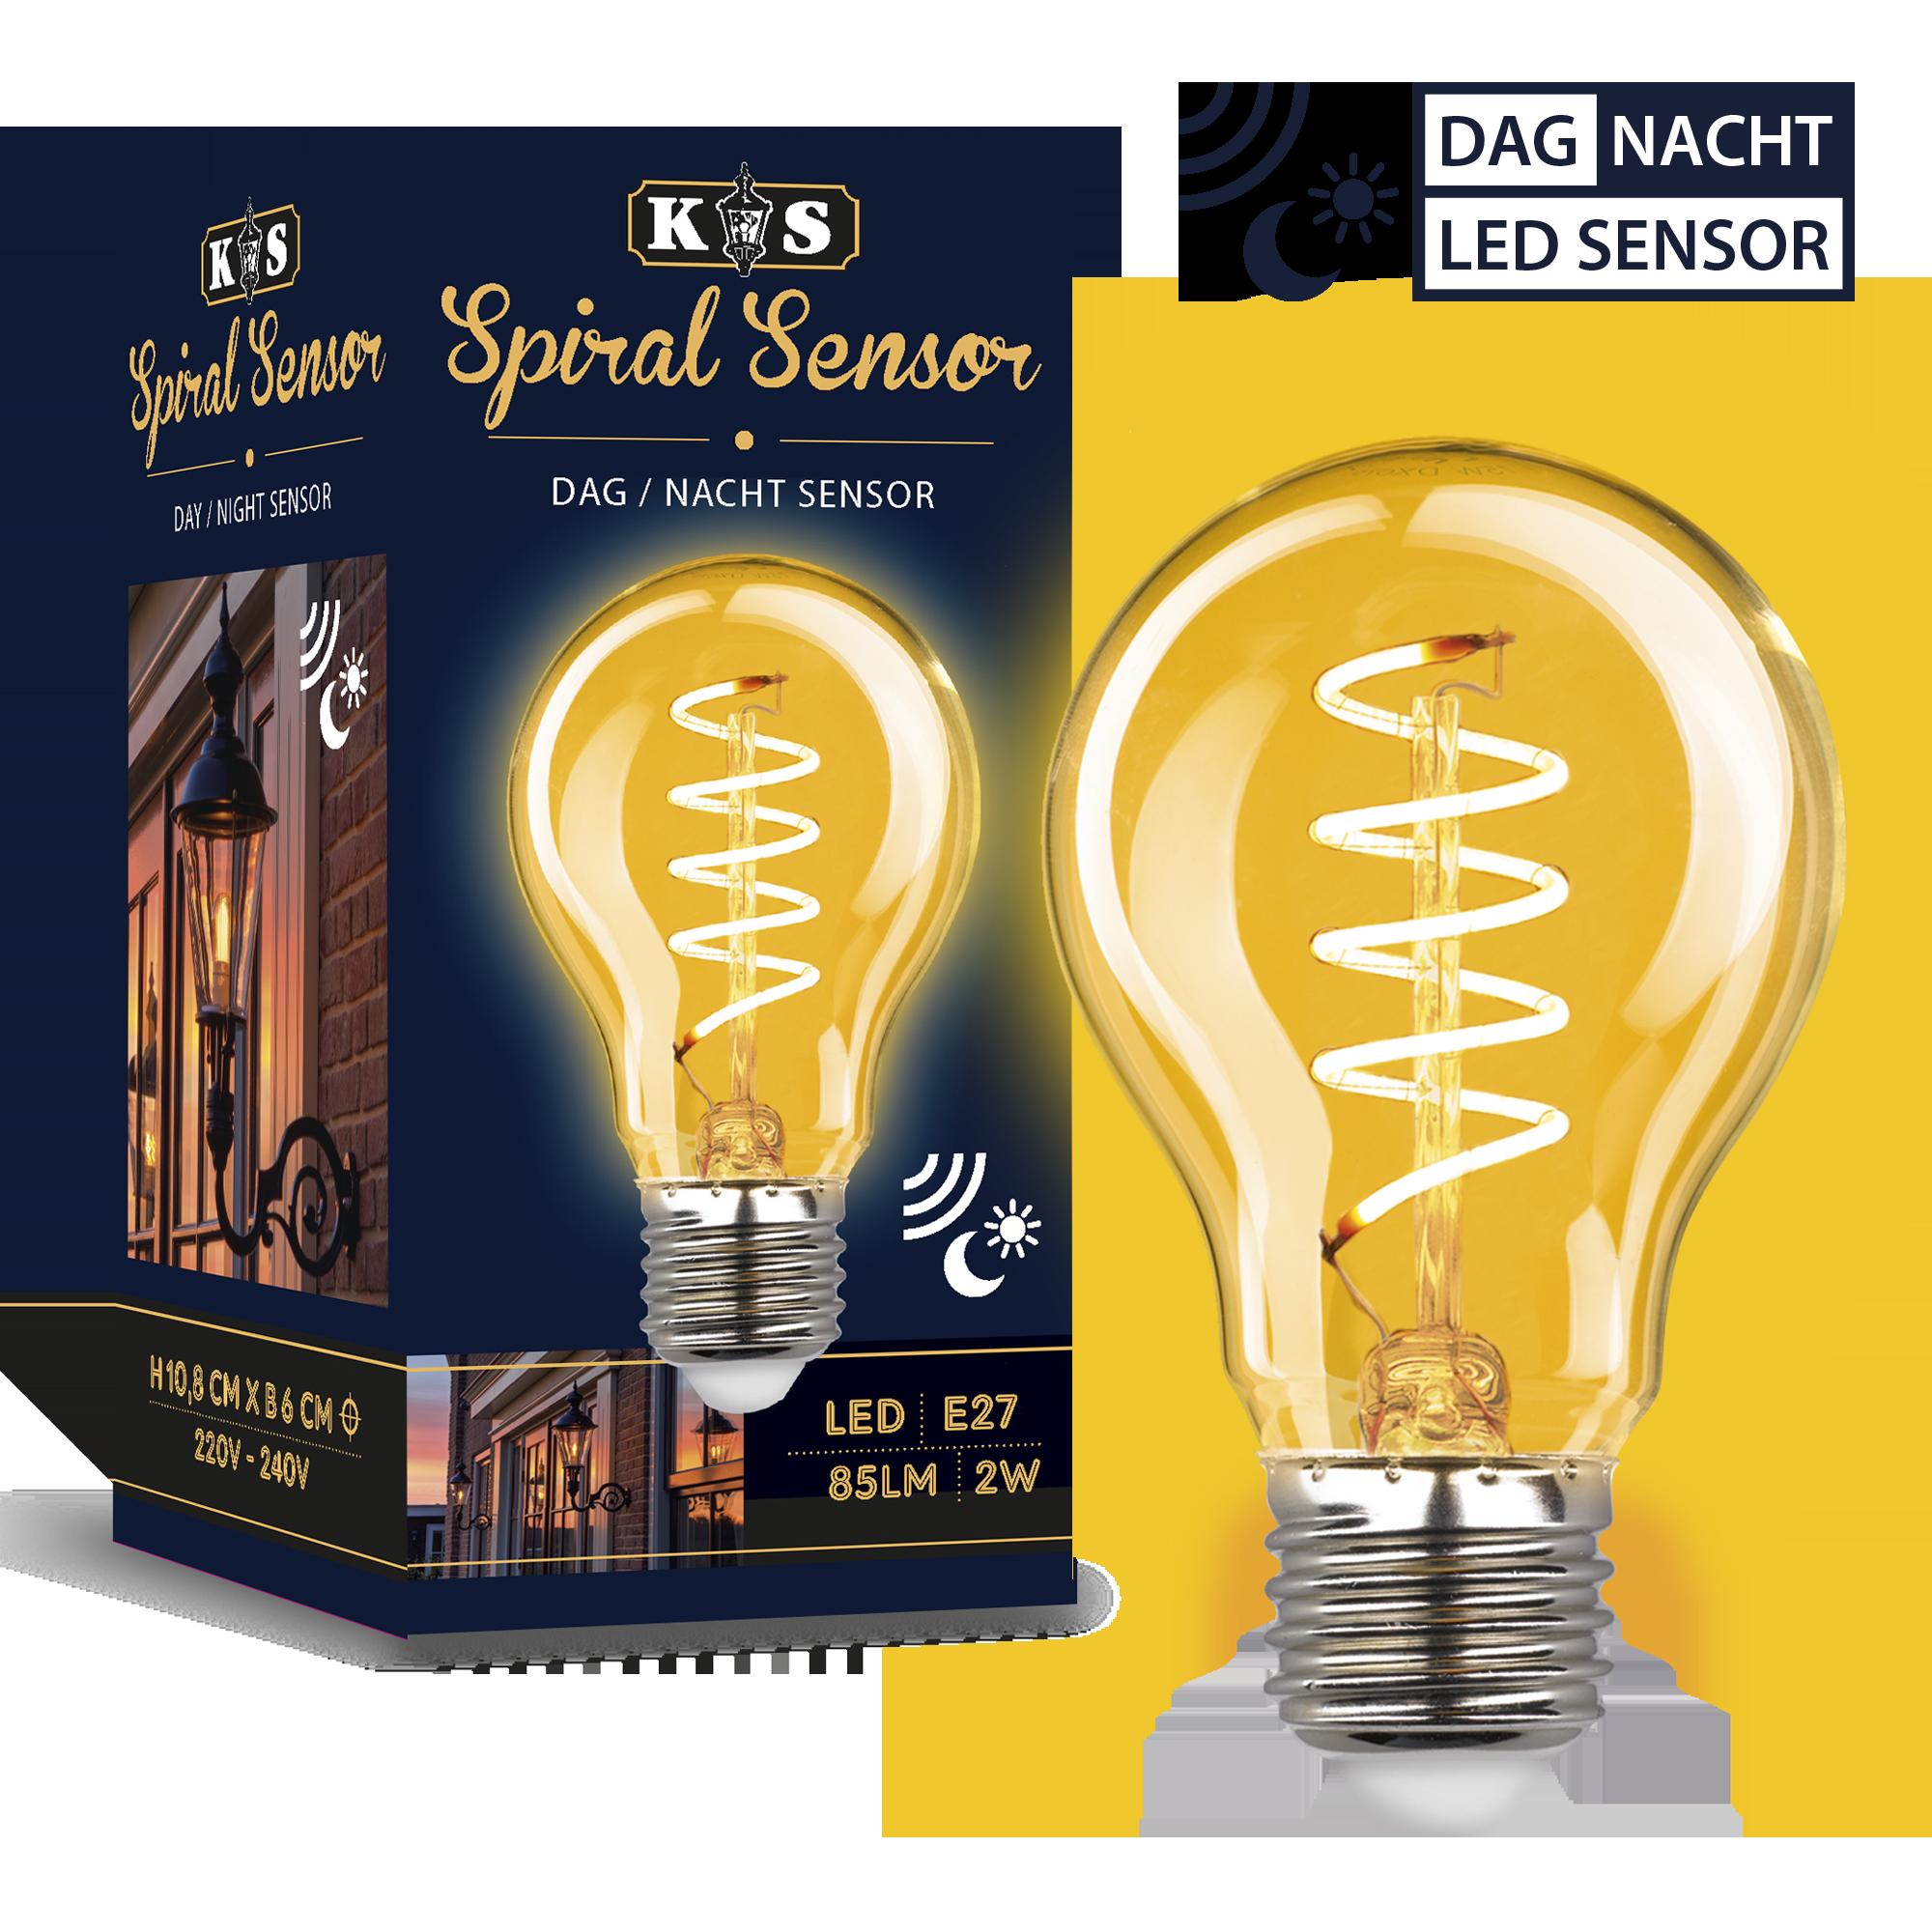 LED Tag / Nacht Sensor Spiral